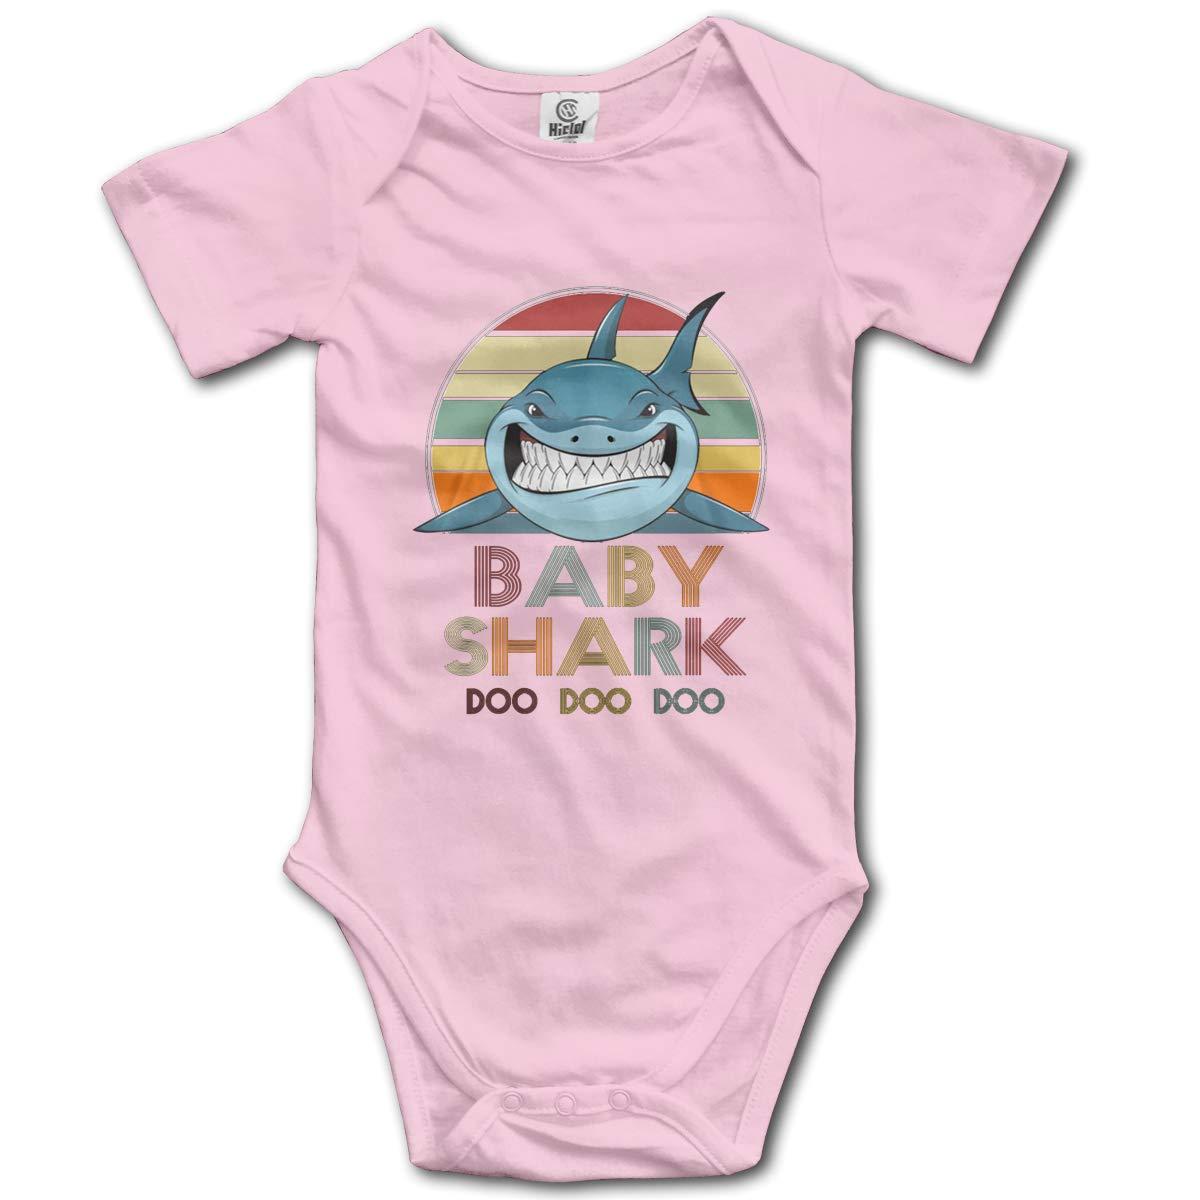 PORRO Baby Boy Girl O-Neck Short Sleeve Bodysuit Baby Shark Funny Doo Doo Clothing Funny Crawling Suit Black